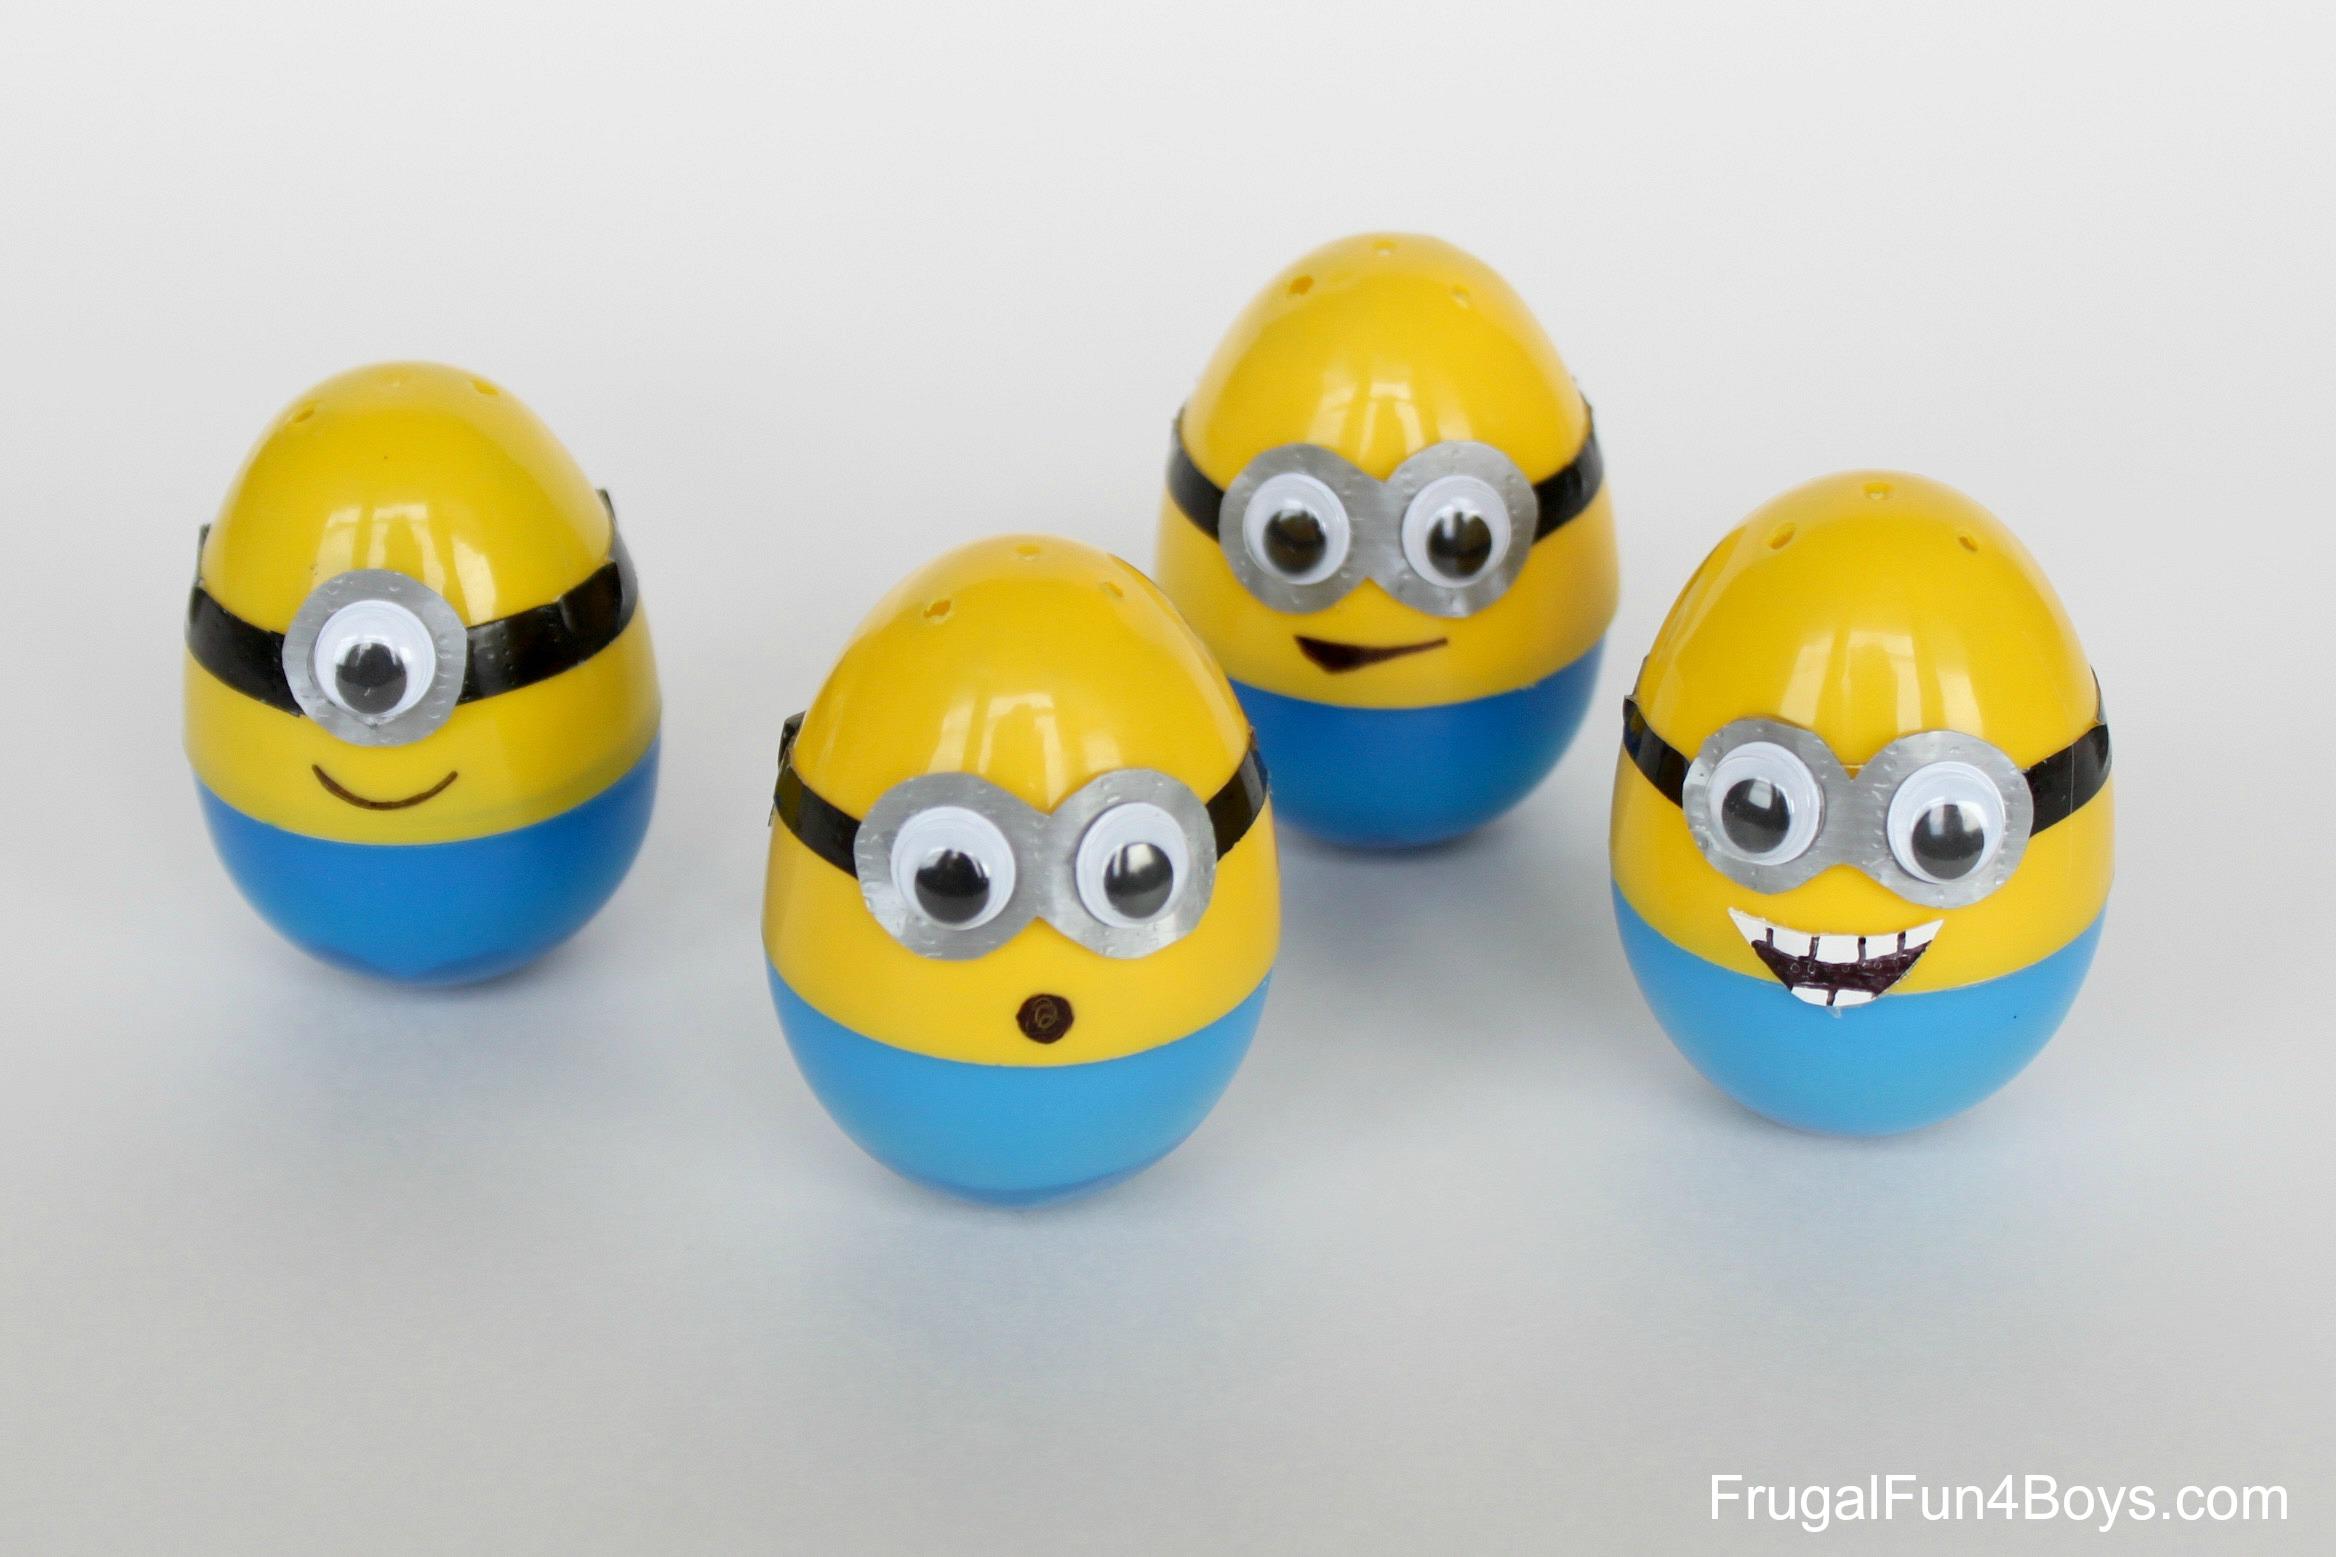 Wobble Egg Minions